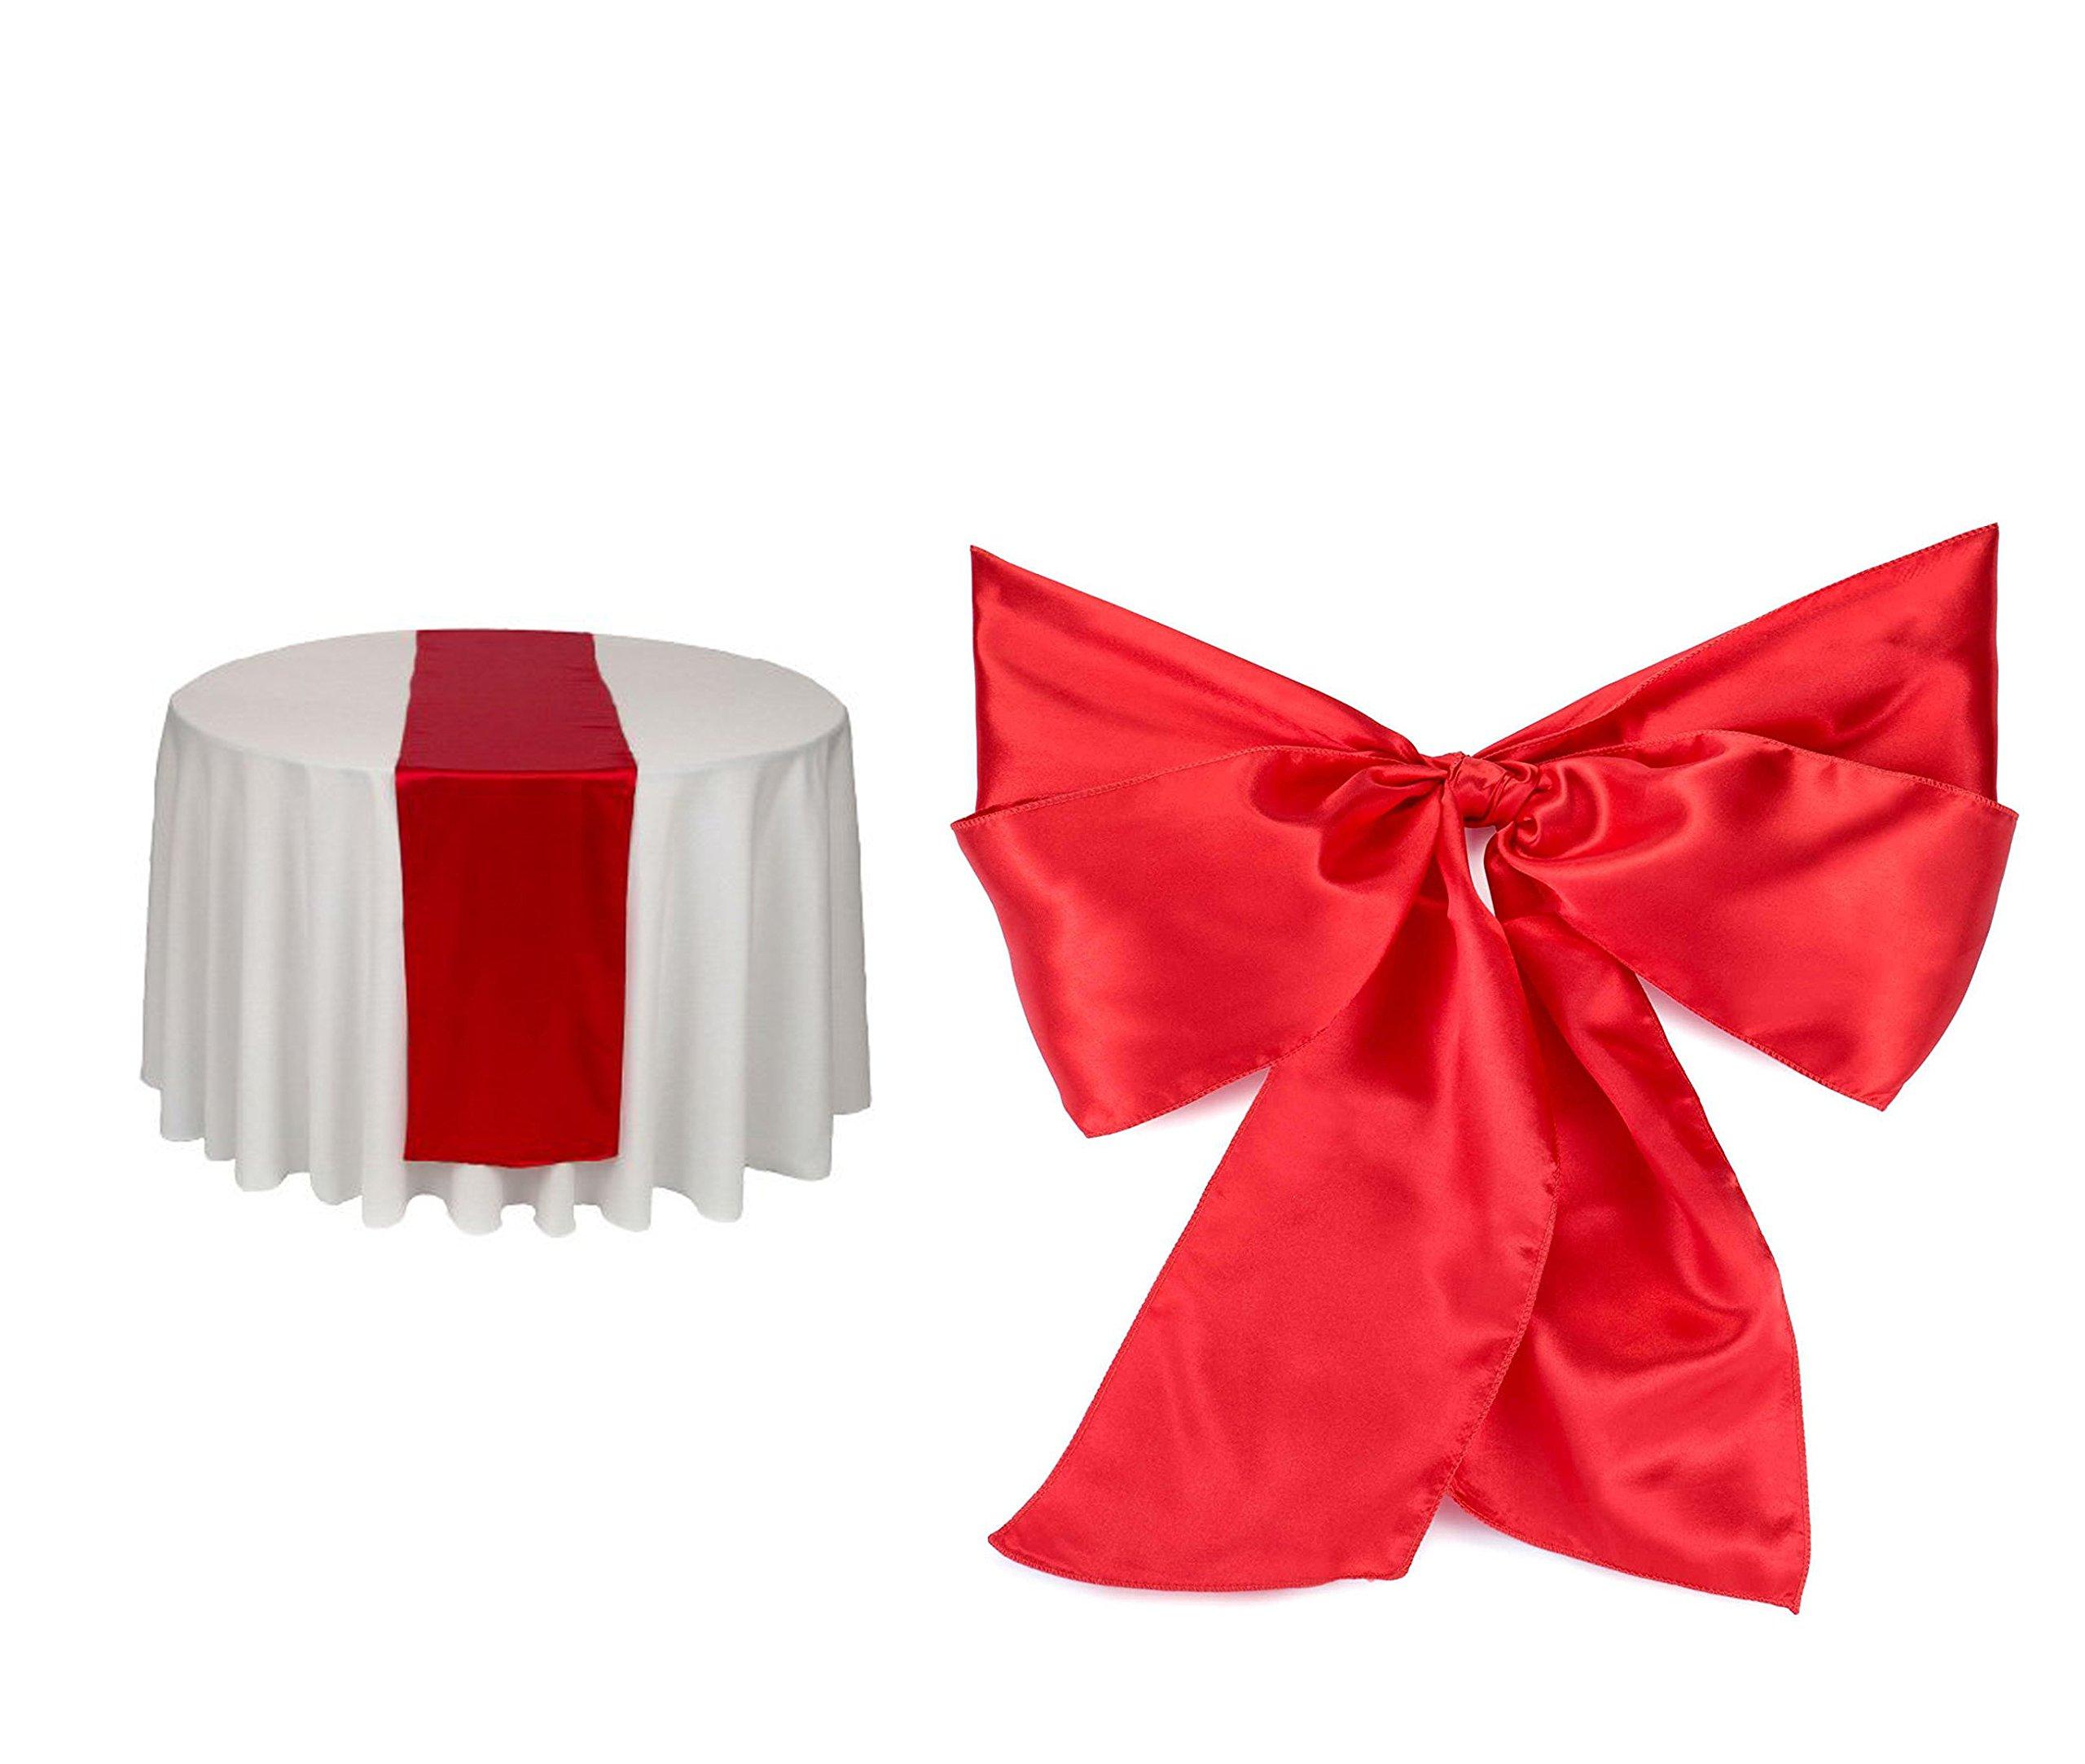 Elina Home RED Satin 2 Table Runner & 10 Combo of TableRunner & Chair Bow Sash for Wedding